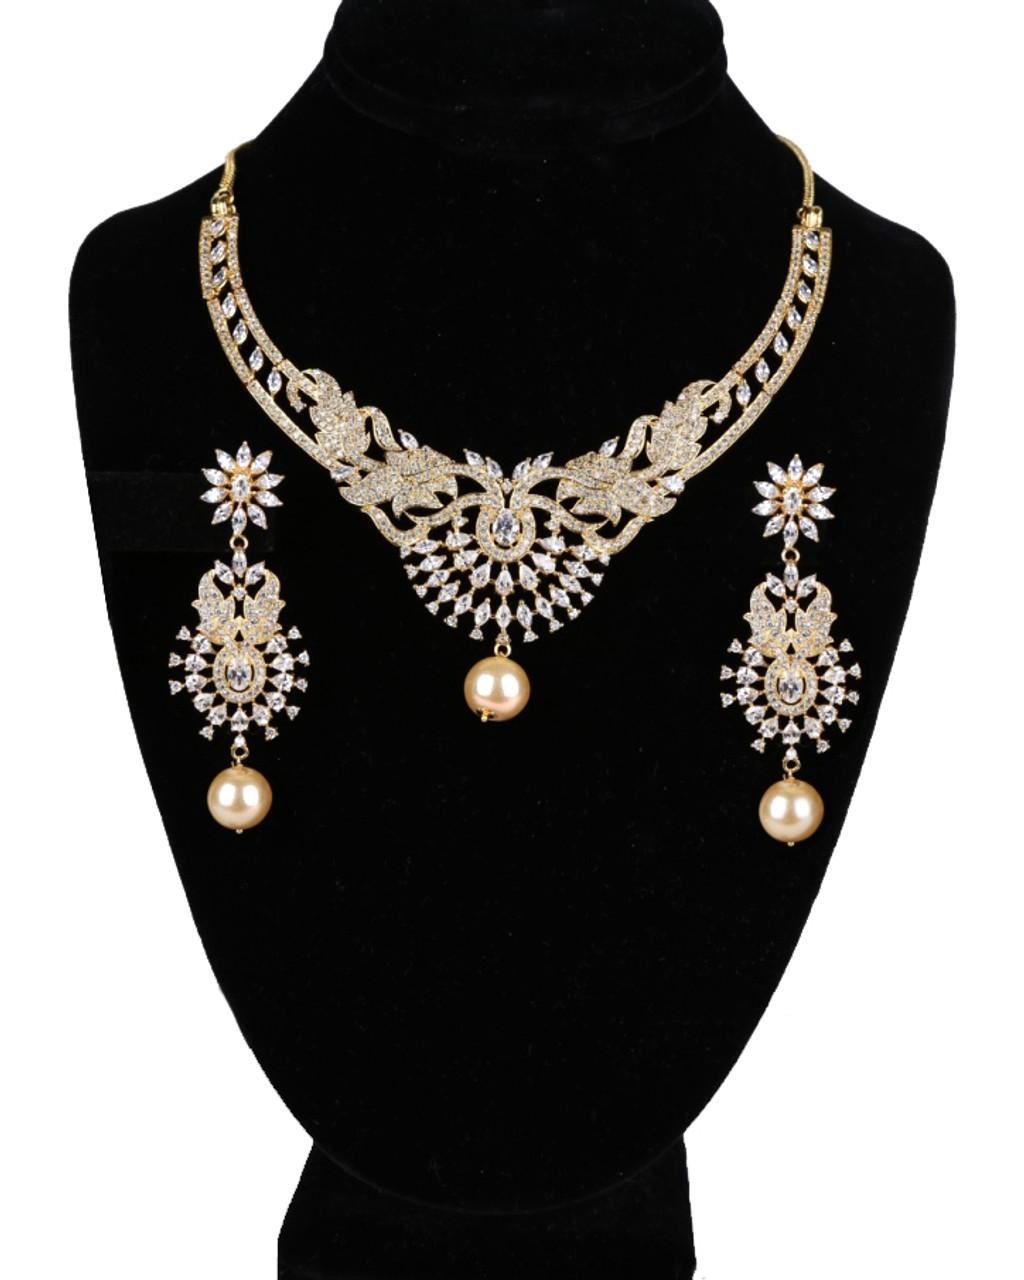 Heavy Designer Amazing Gold Plated American Diamond Cz Bridal Necklace Set With White Rhinestones